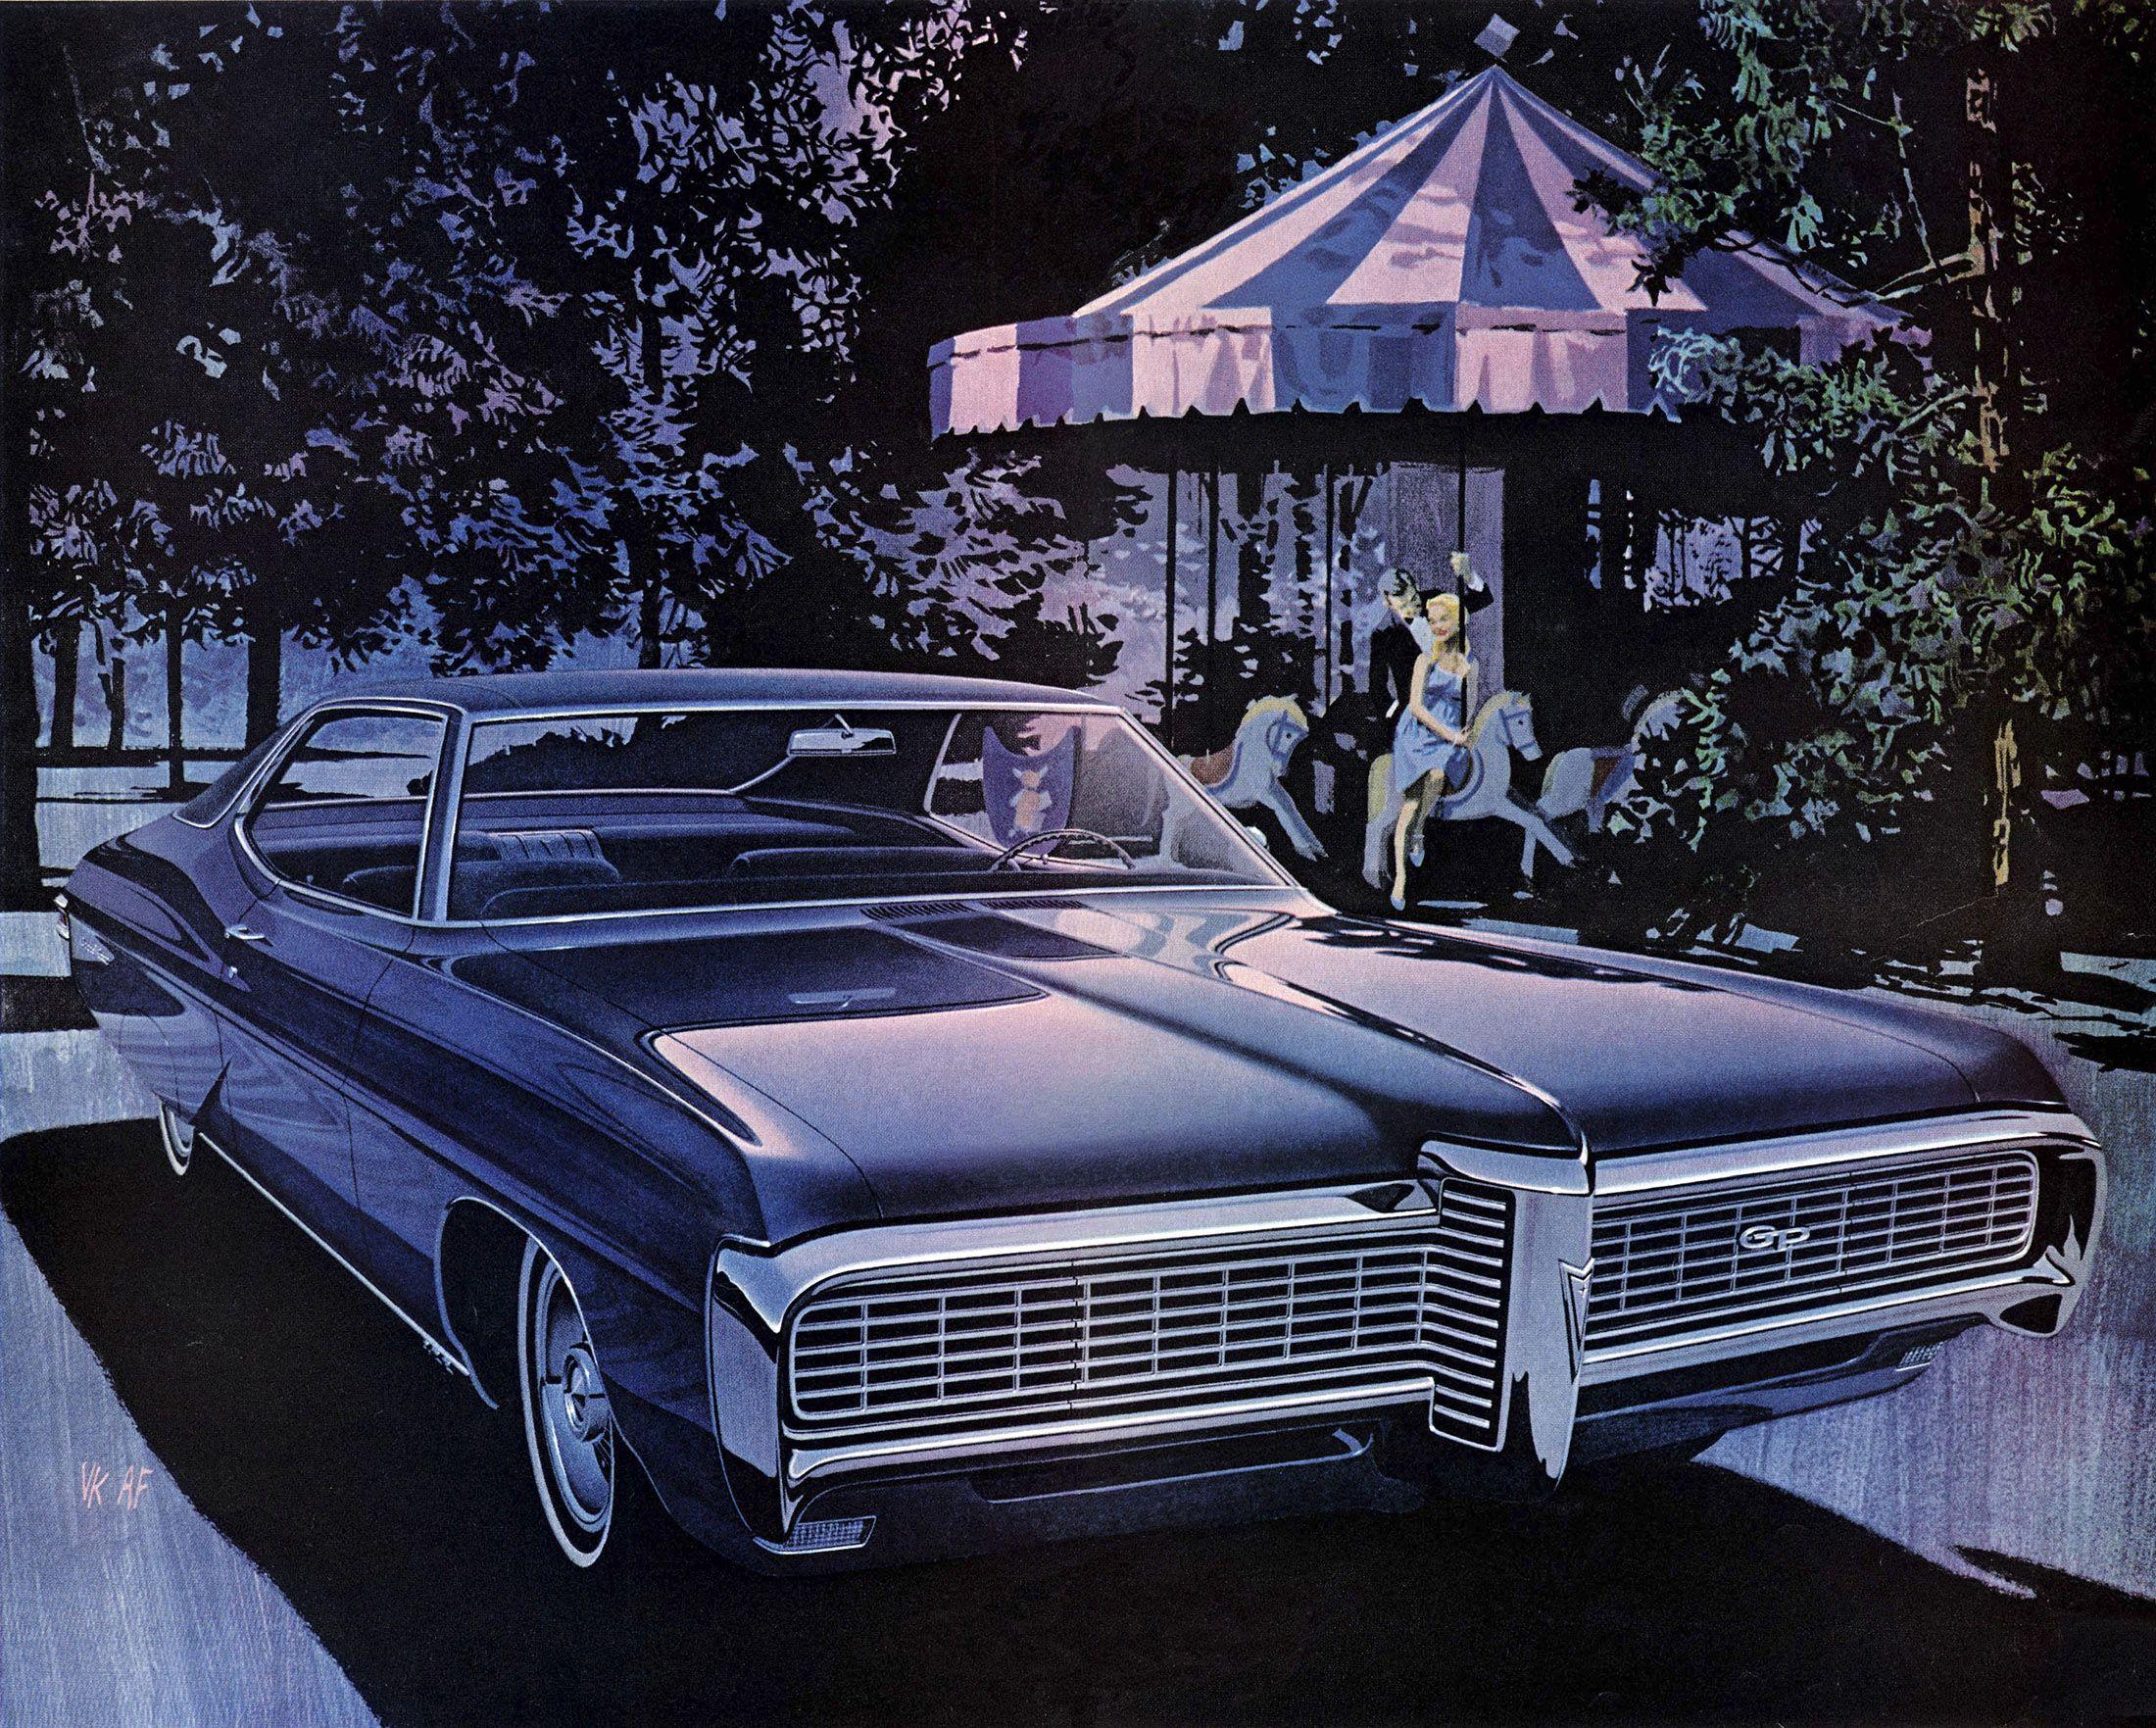 1968 Pontiac Grand Prix – 'Carousel': Art Fitzpatrick and Van Kaufman